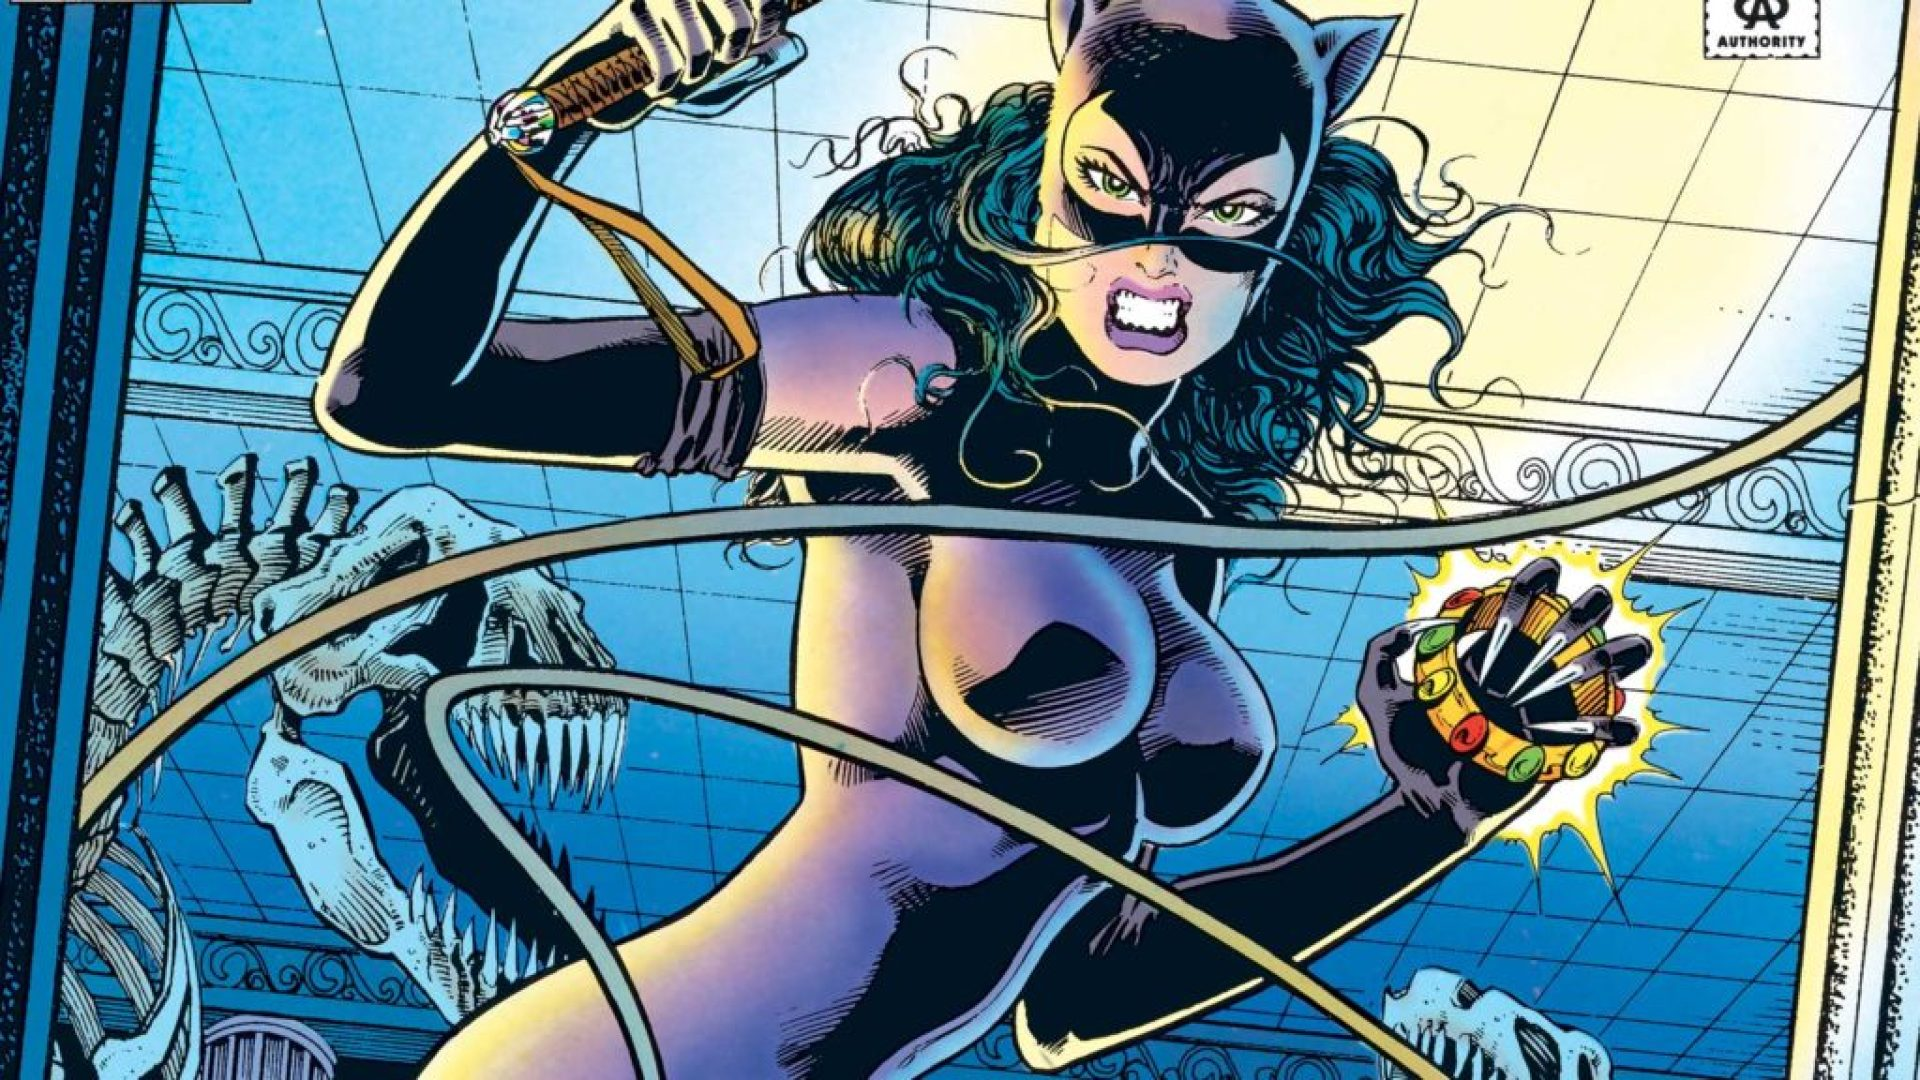 Jim Balent art of Catwoman